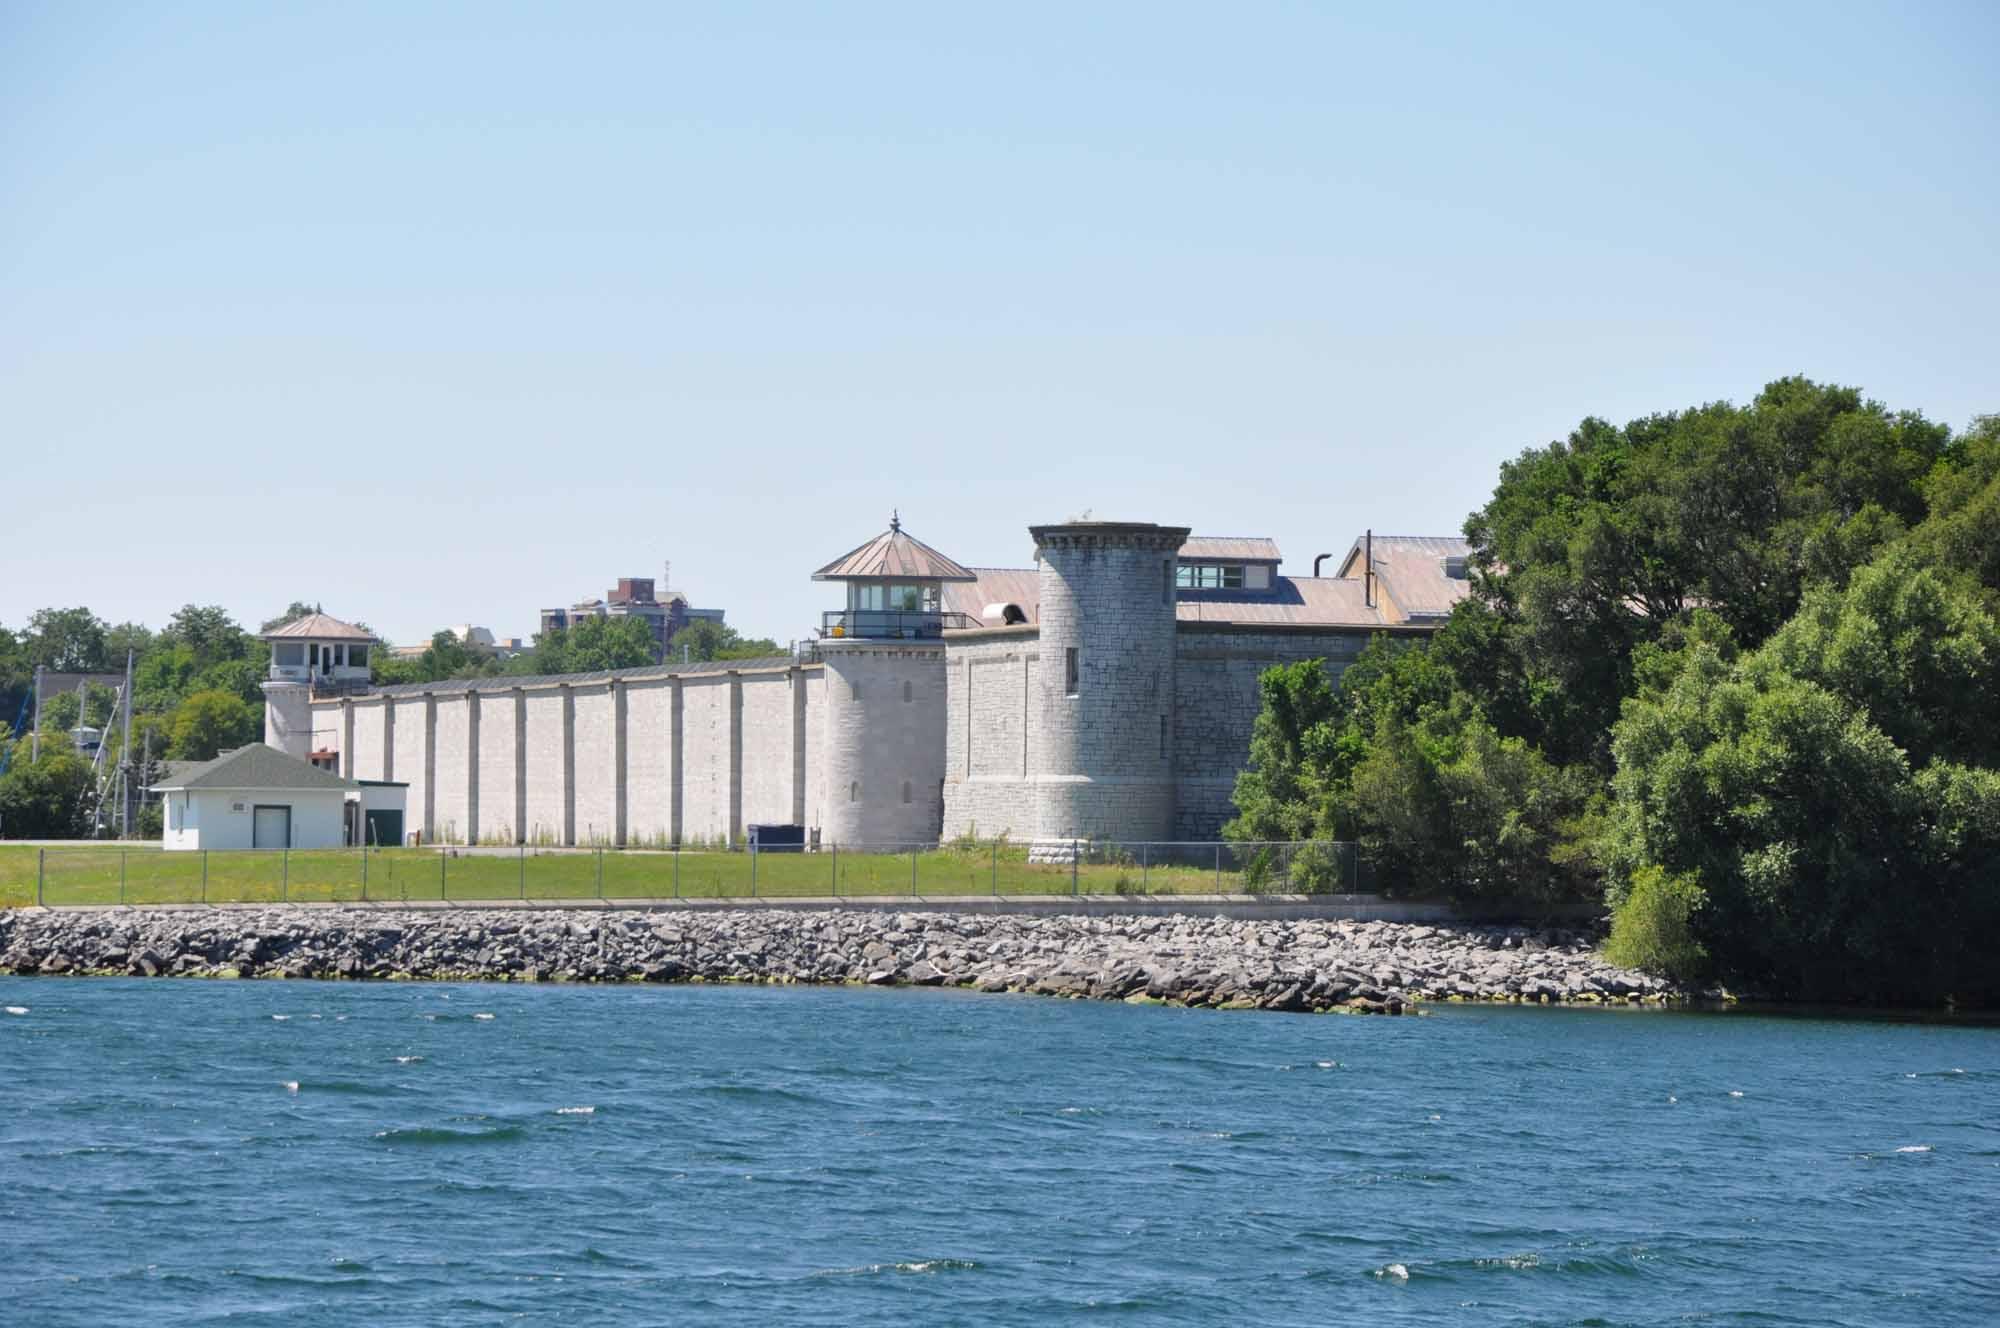 Kingston Penitentiary in Ontario